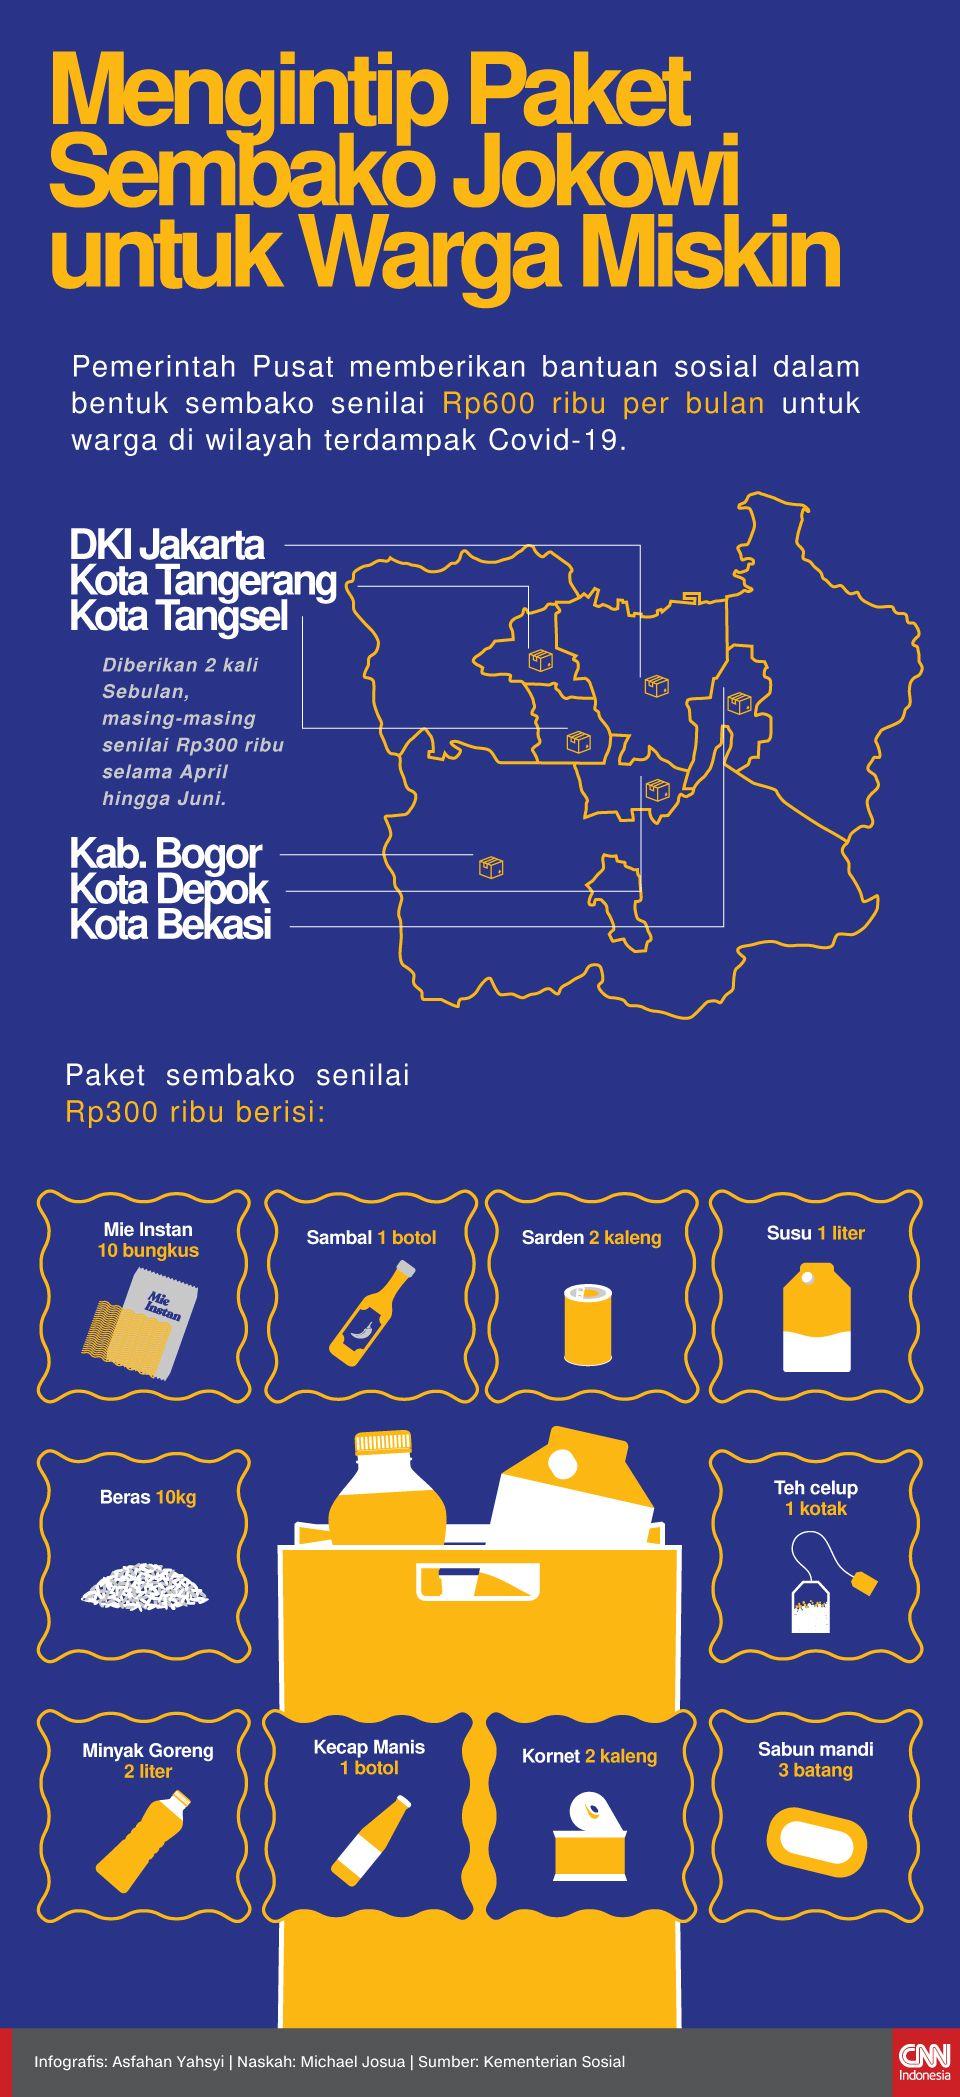 Infografis Mengintip Paket Sembako Jokowi untuk Warga Miskin